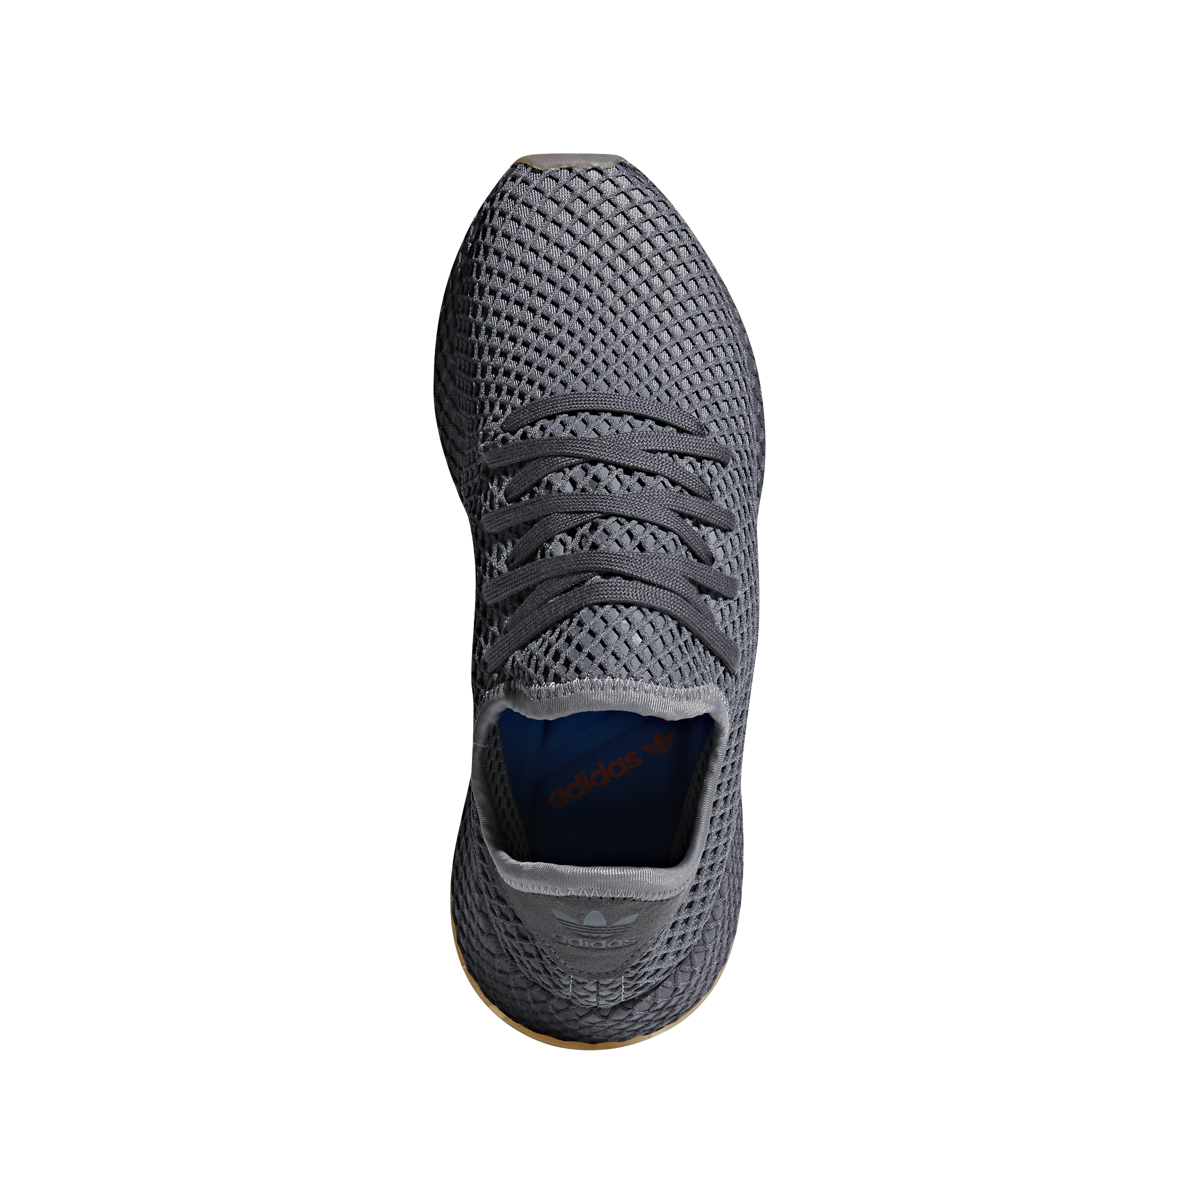 save off 13cb3 ea3e3 Adidas Deerupt in Dark GreyGum. CQ2627.jpg